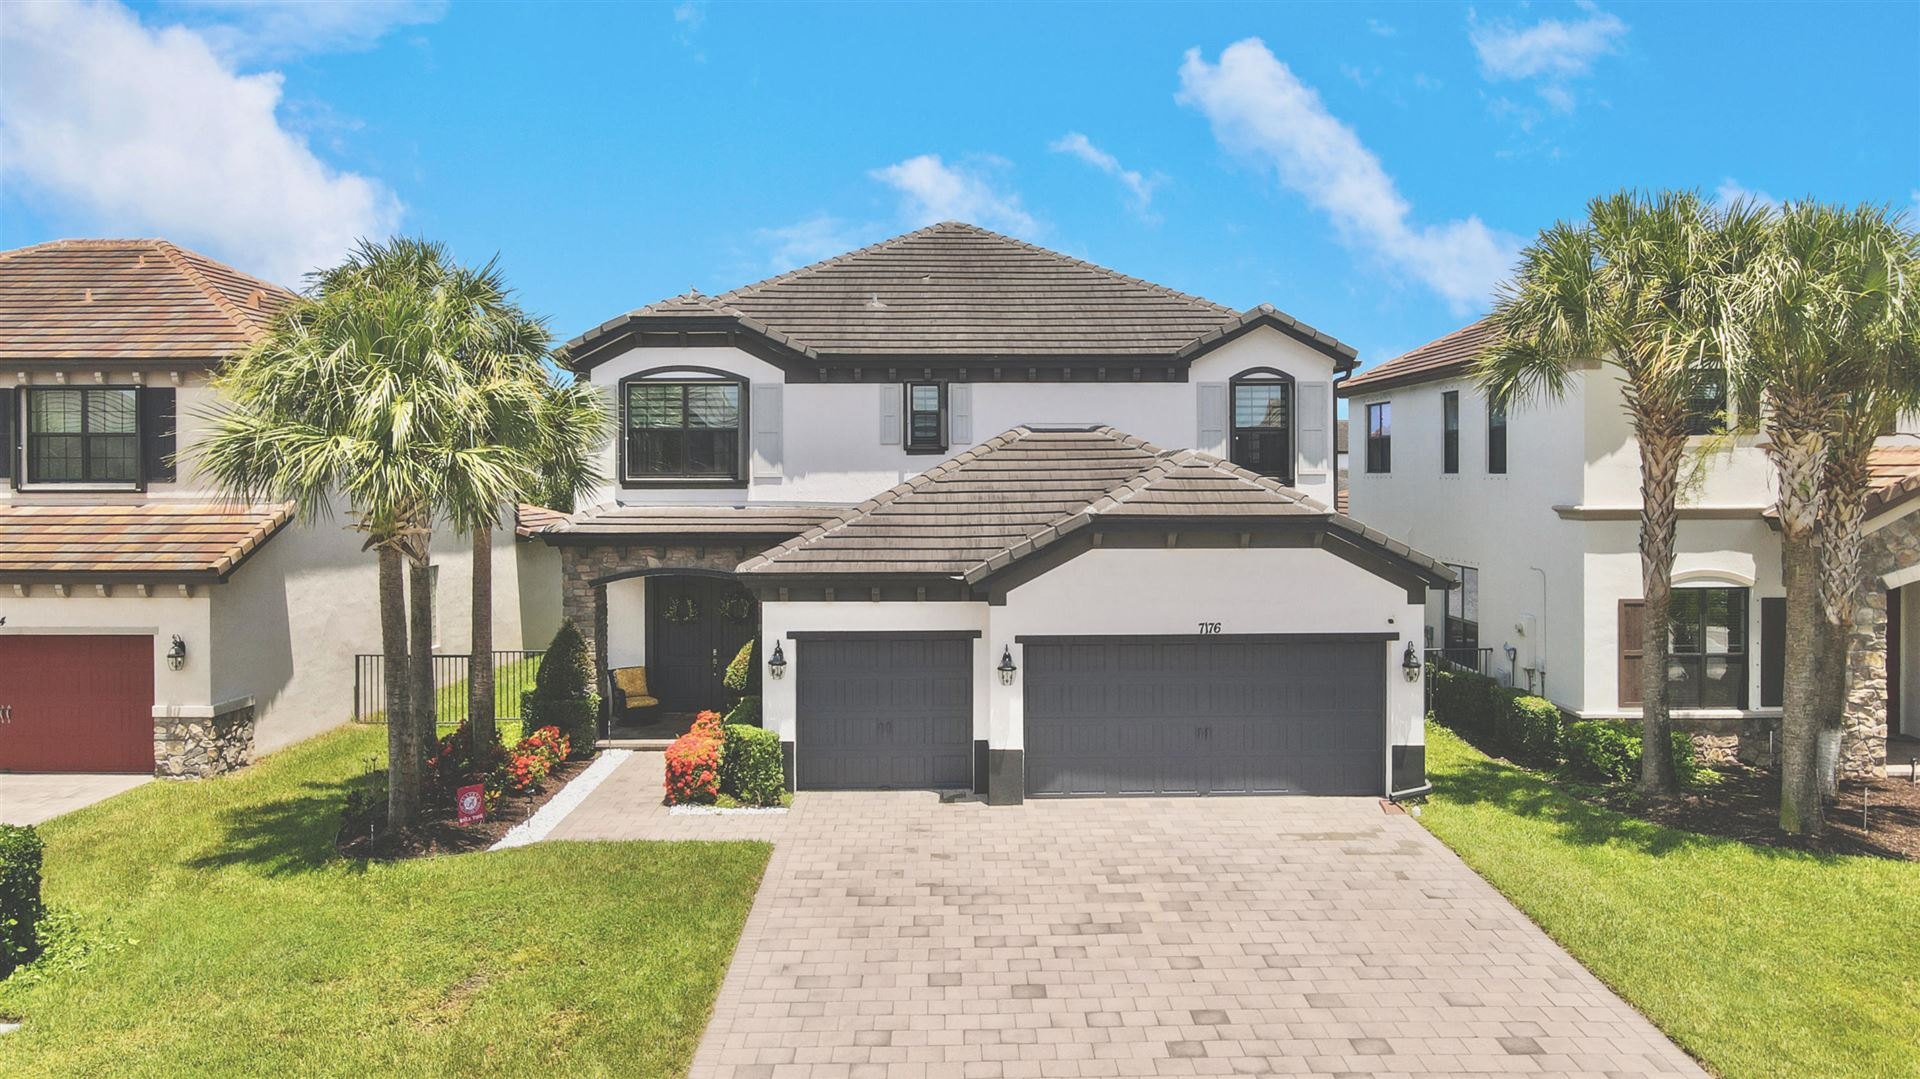 7176 Sandgrace Lane, Lake Worth, FL 33463 - MLS#: RX-10732976